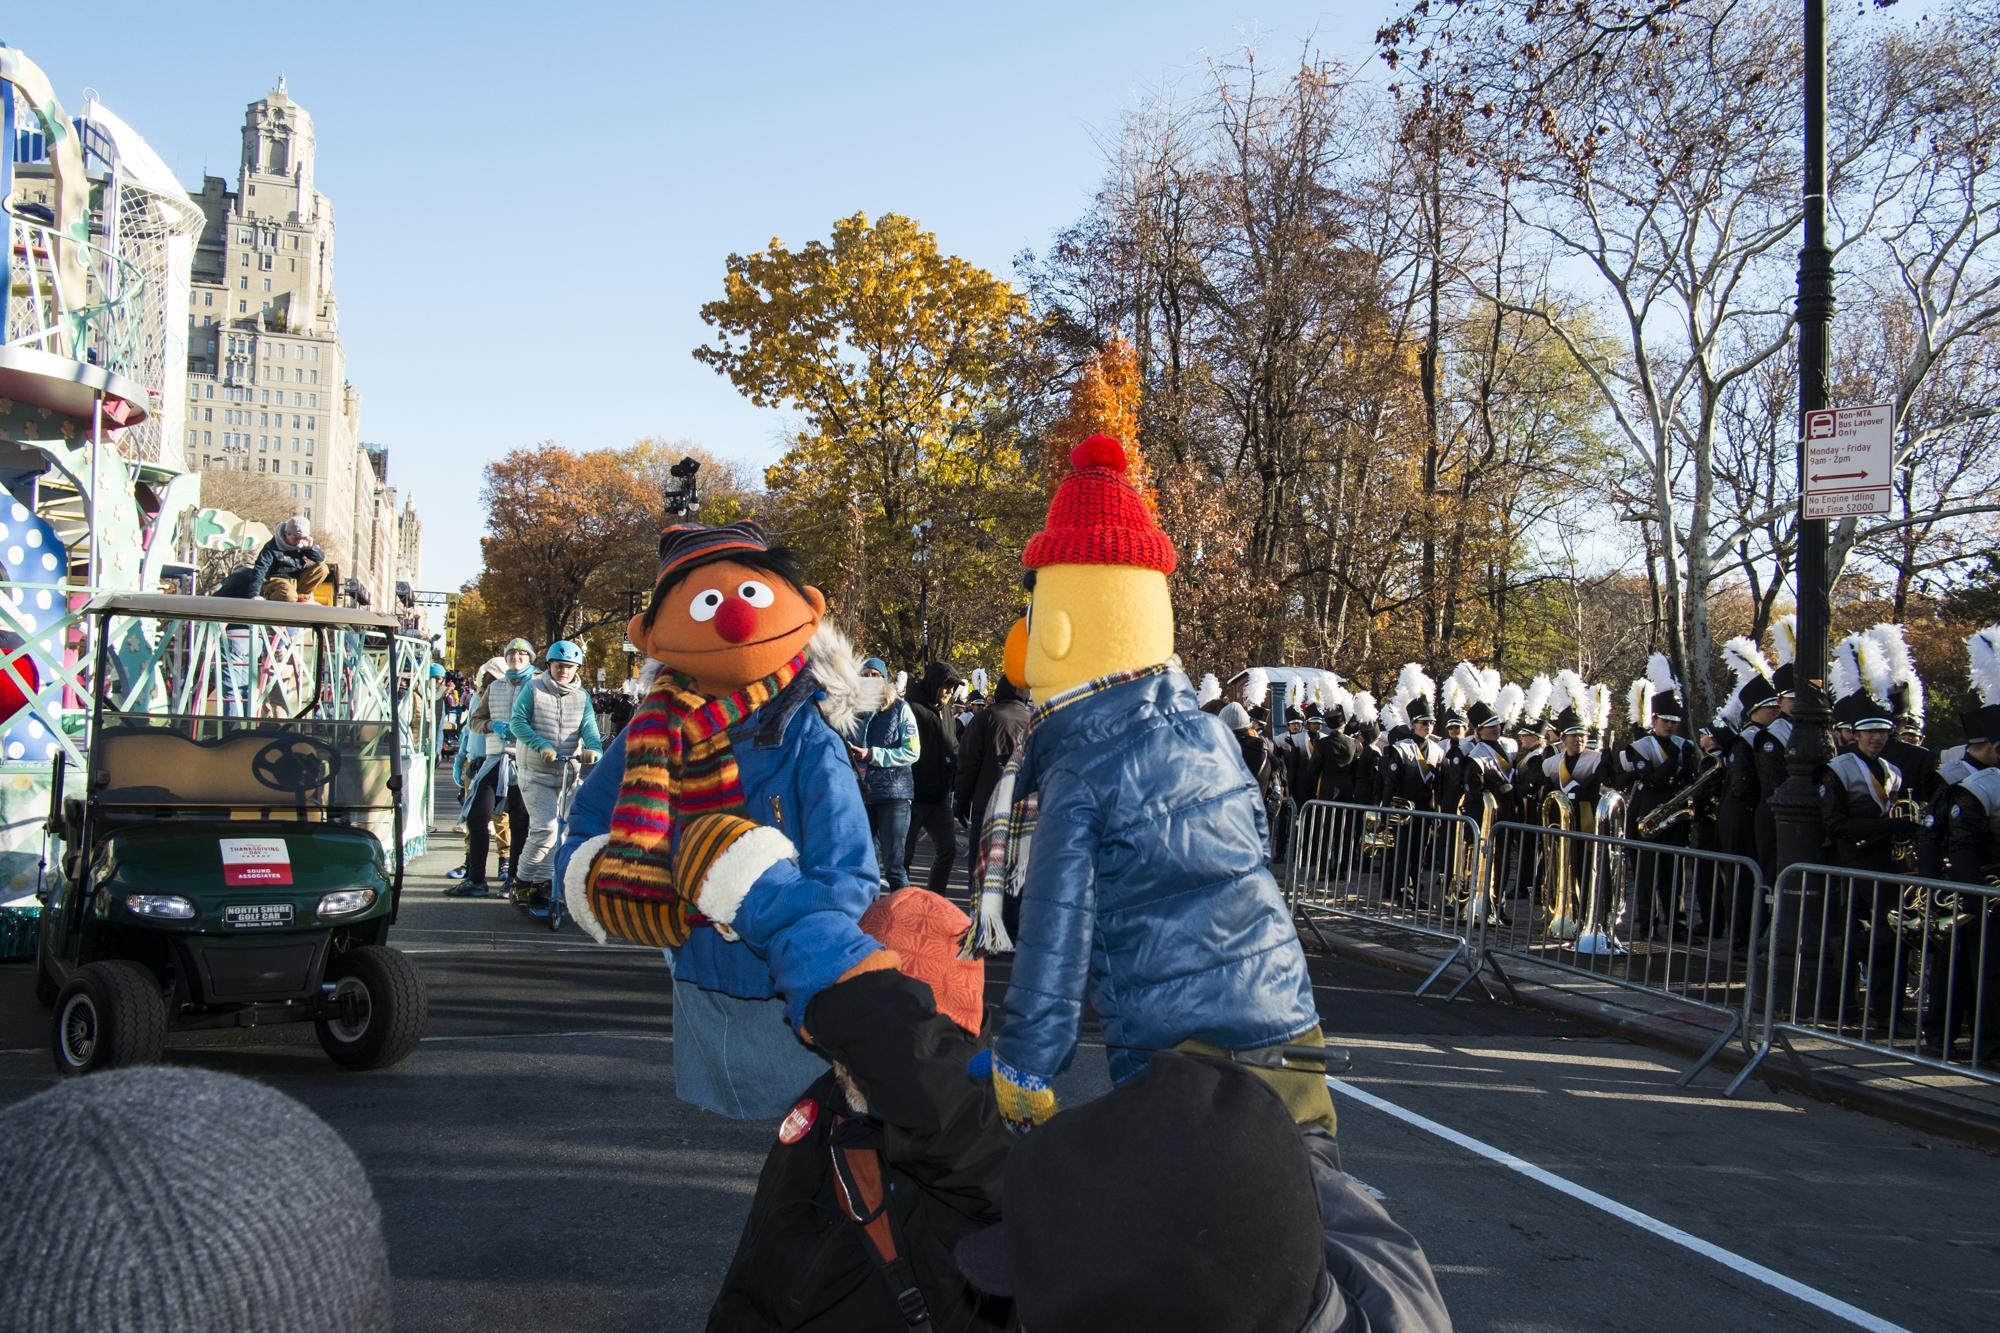 Macys-Thanksgiving-Day-Parade-8.jpg